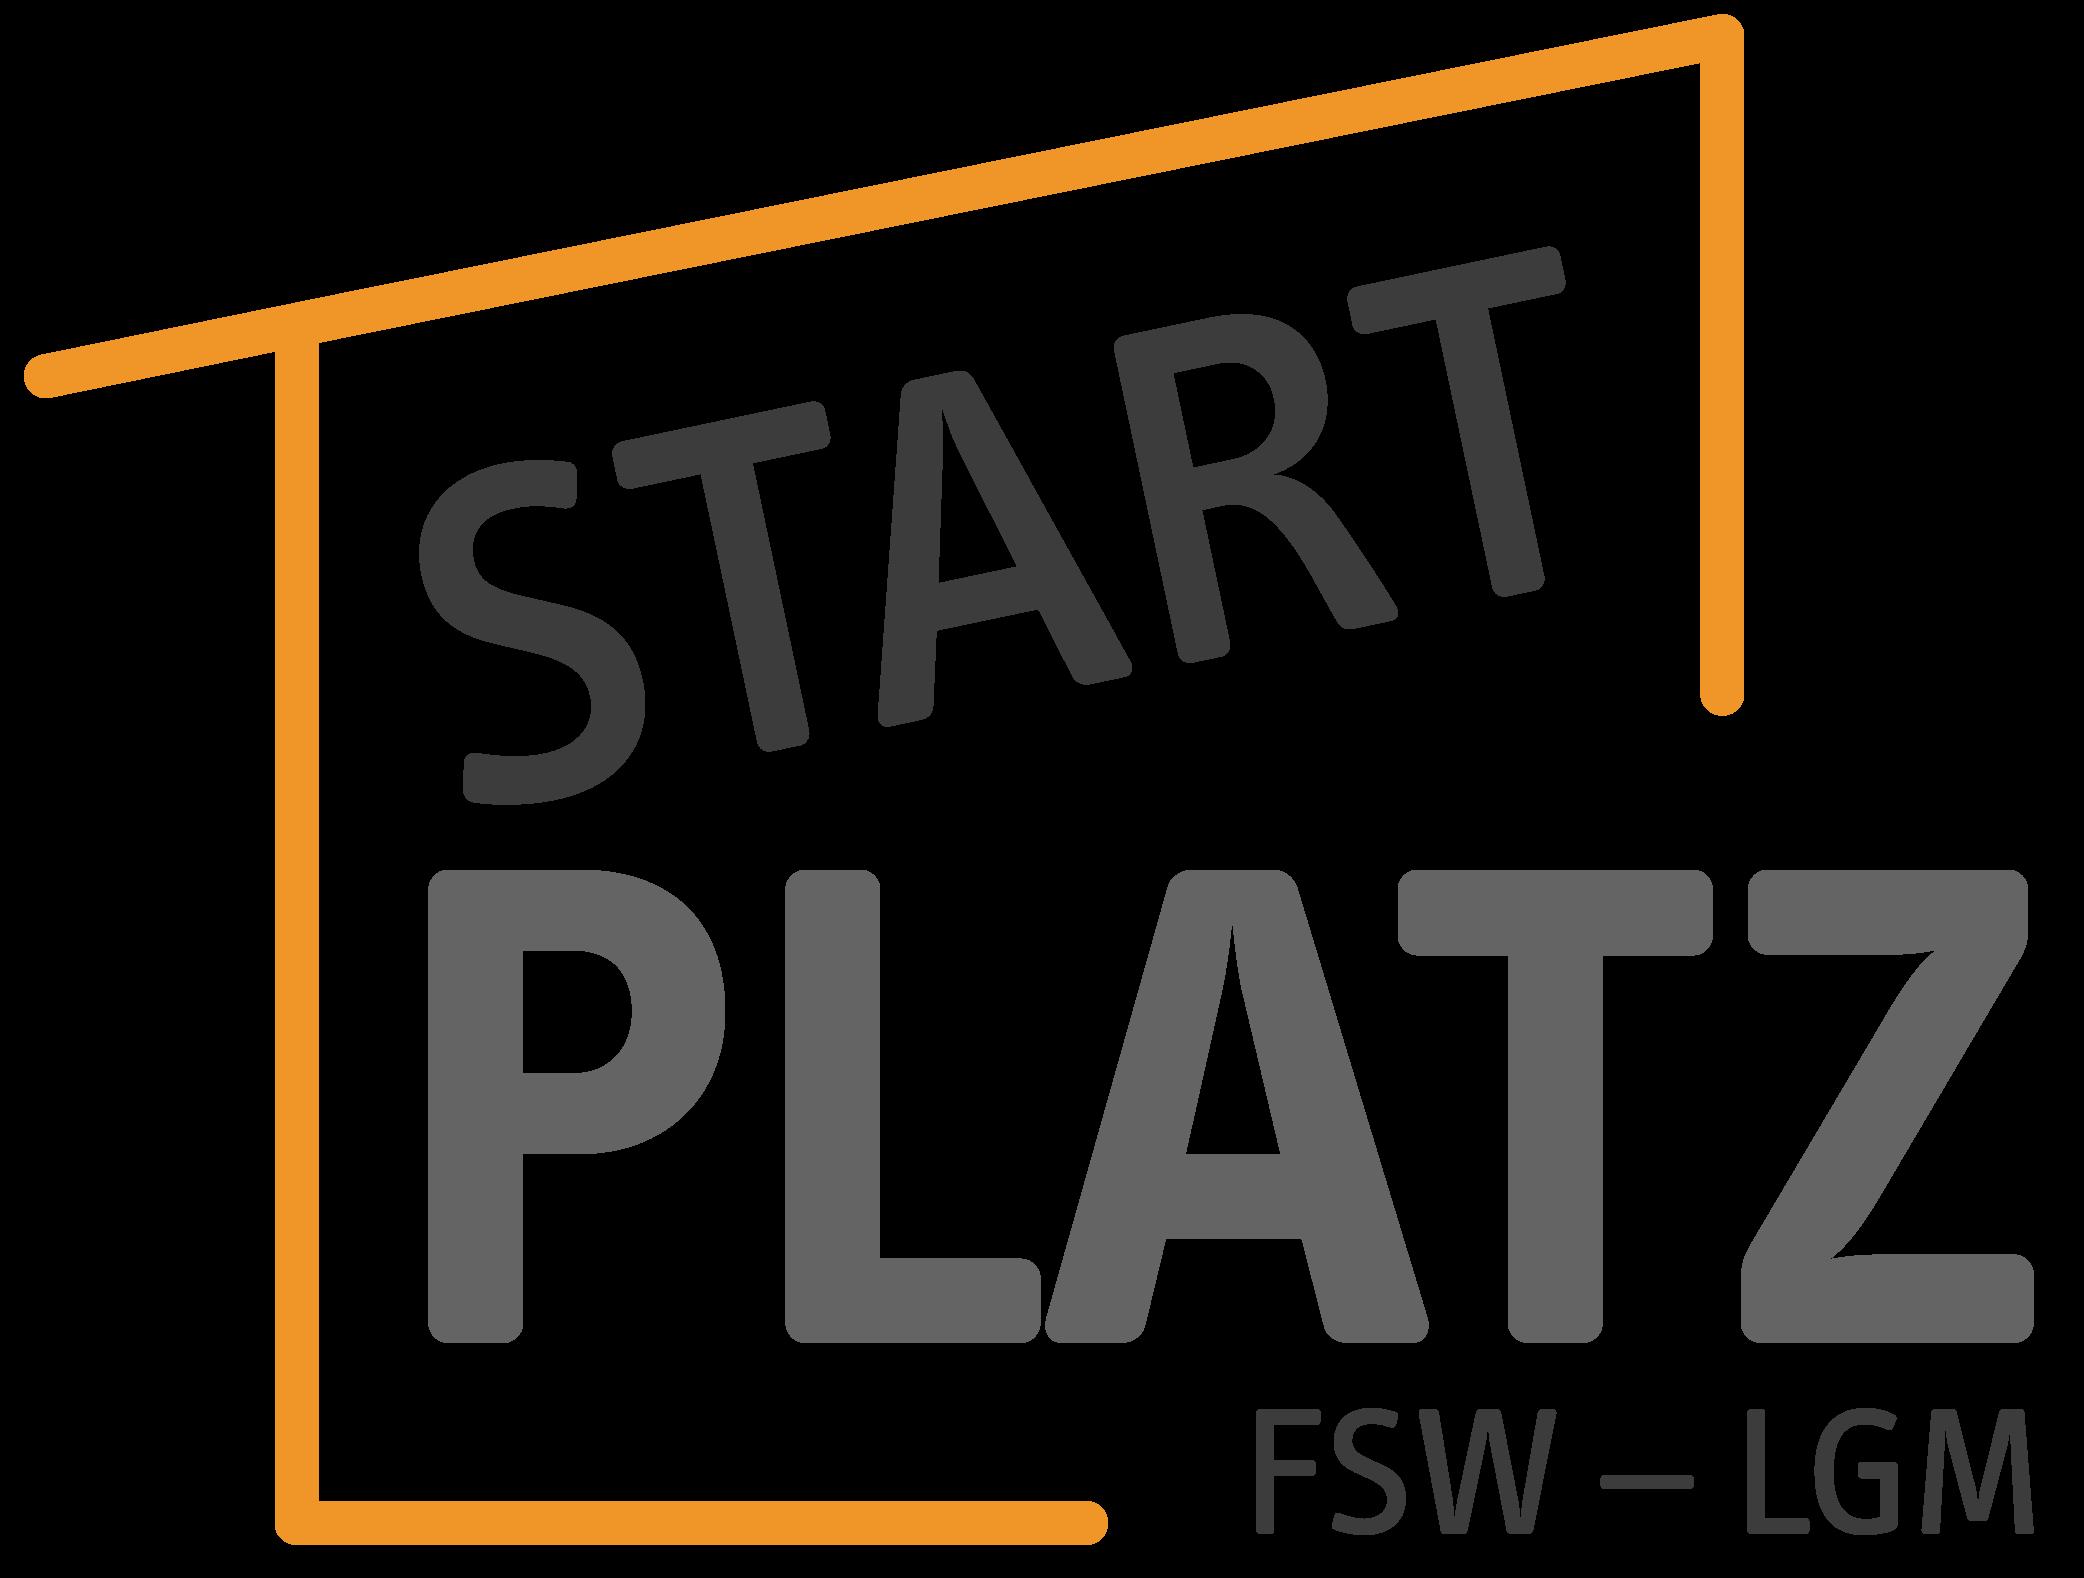 STARTPLATZ Wien Logo